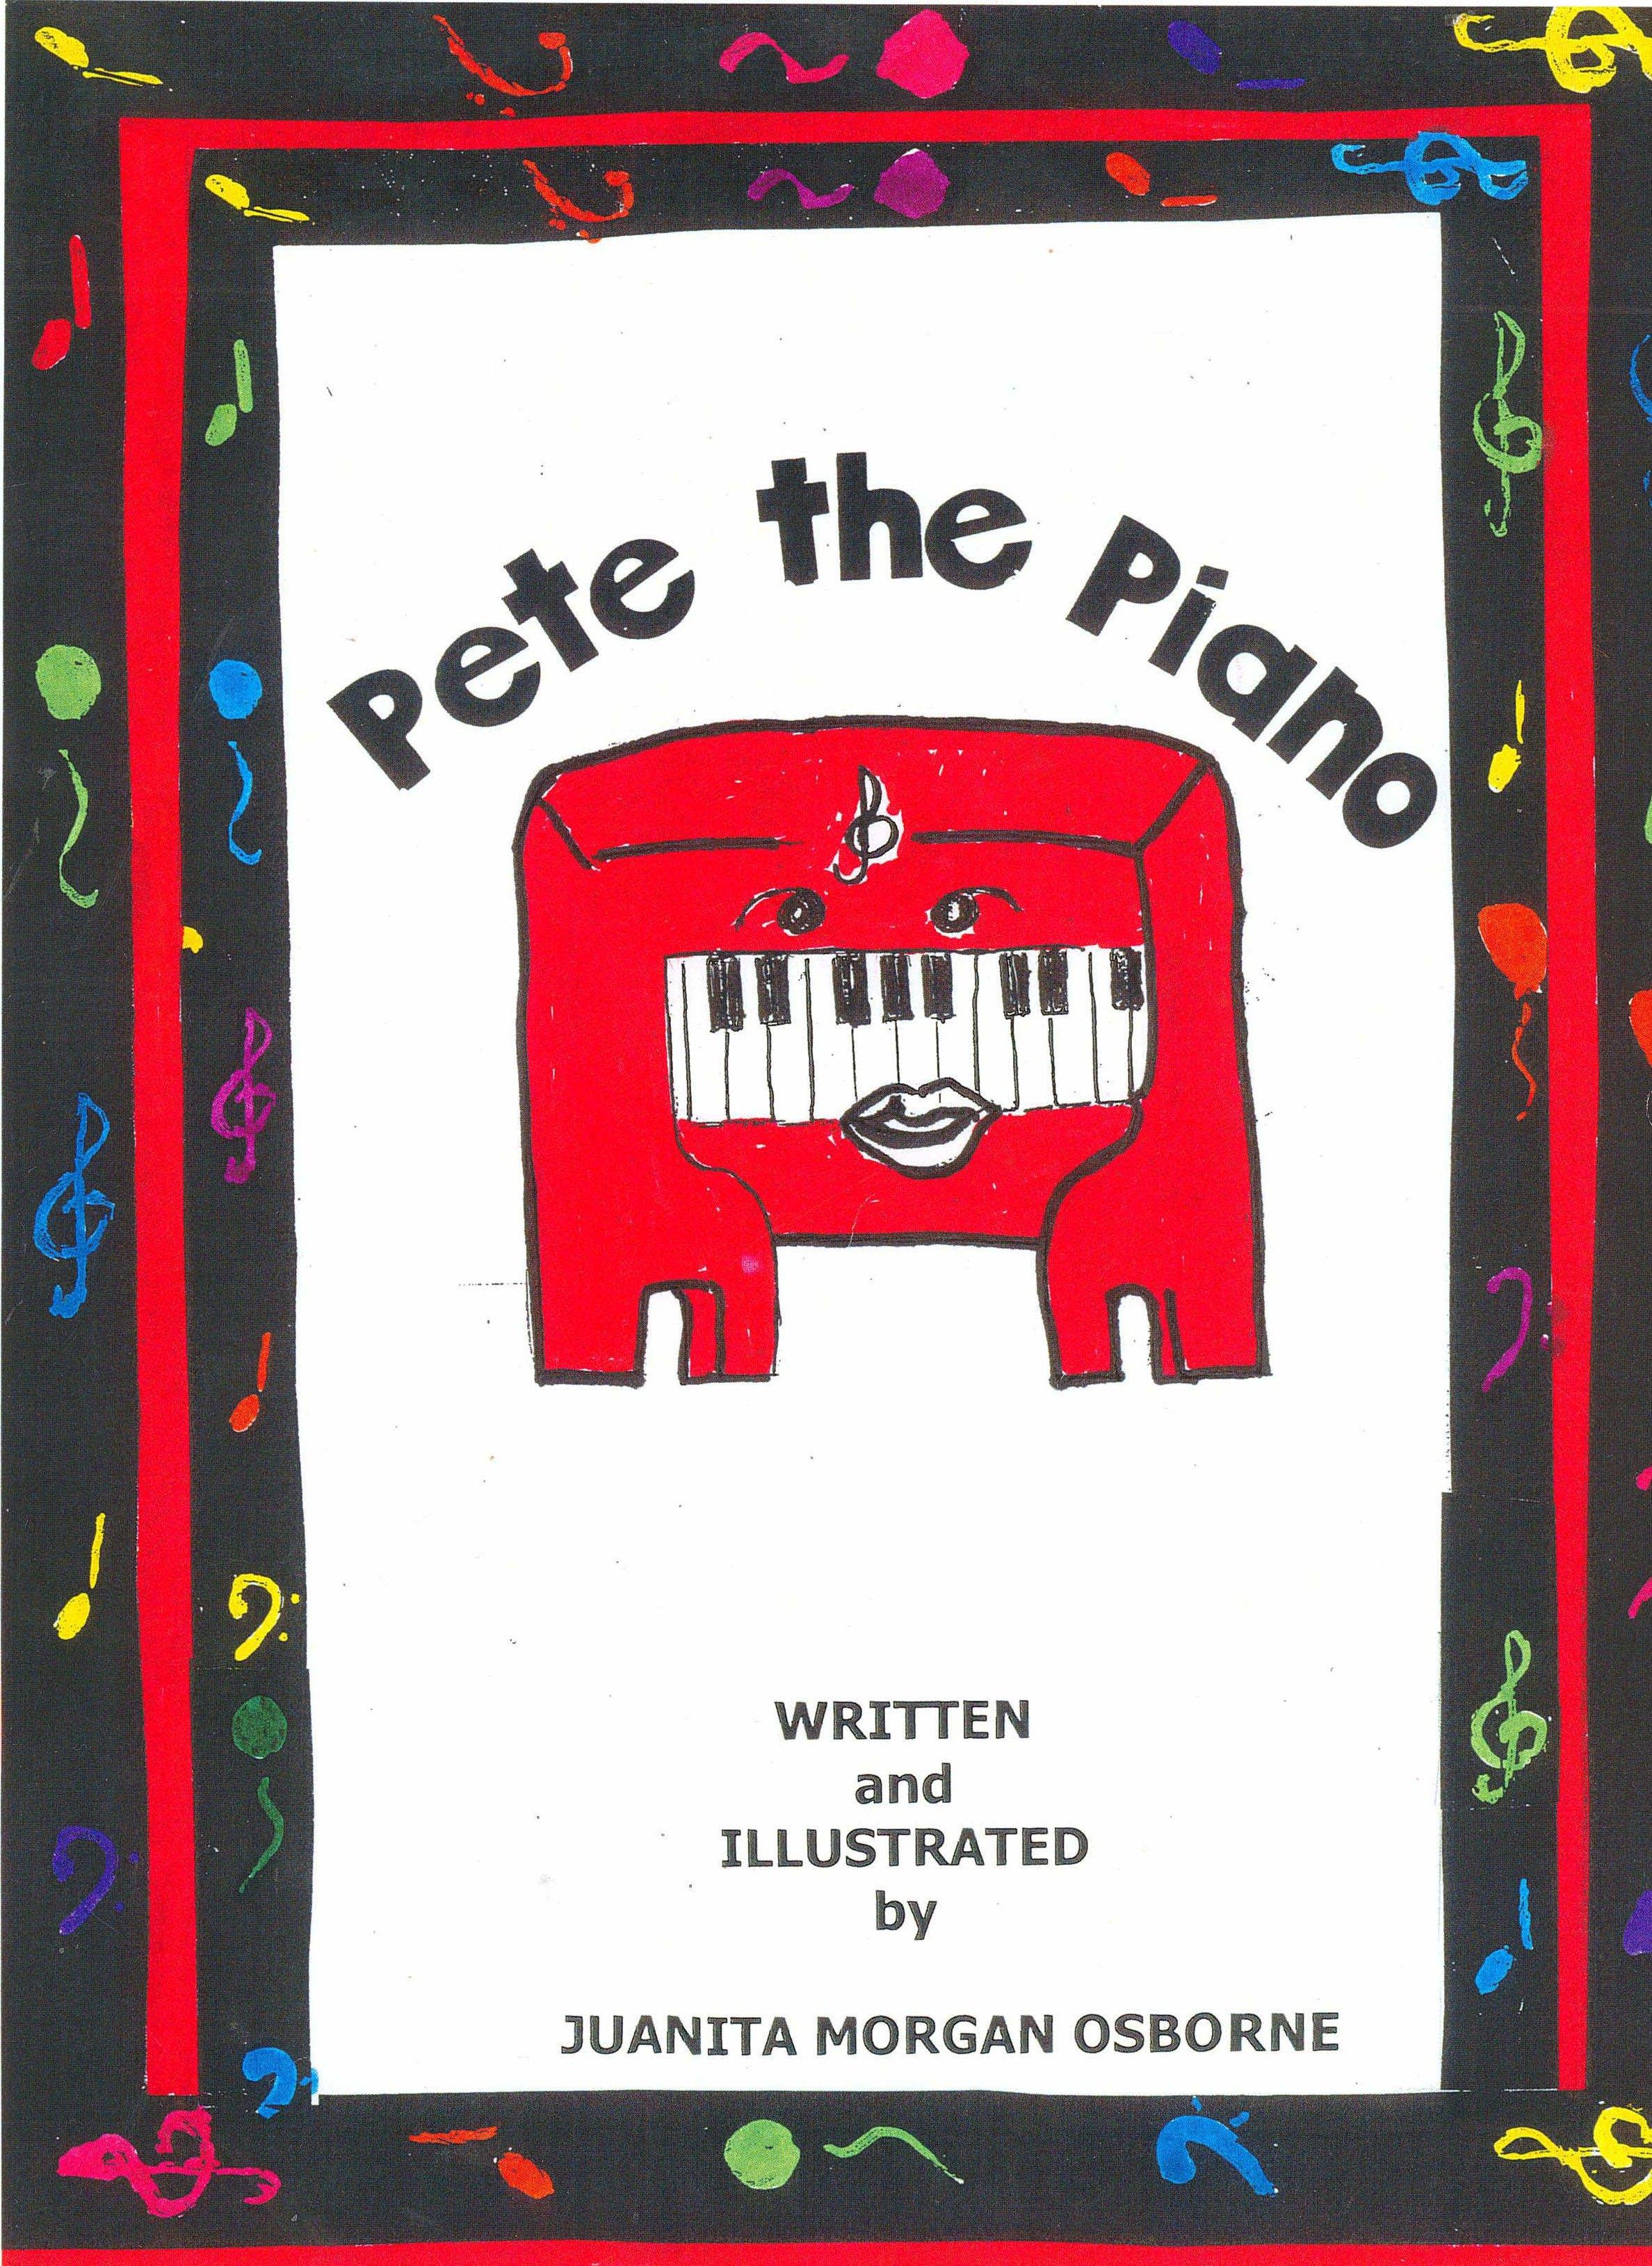 Pete the Piano